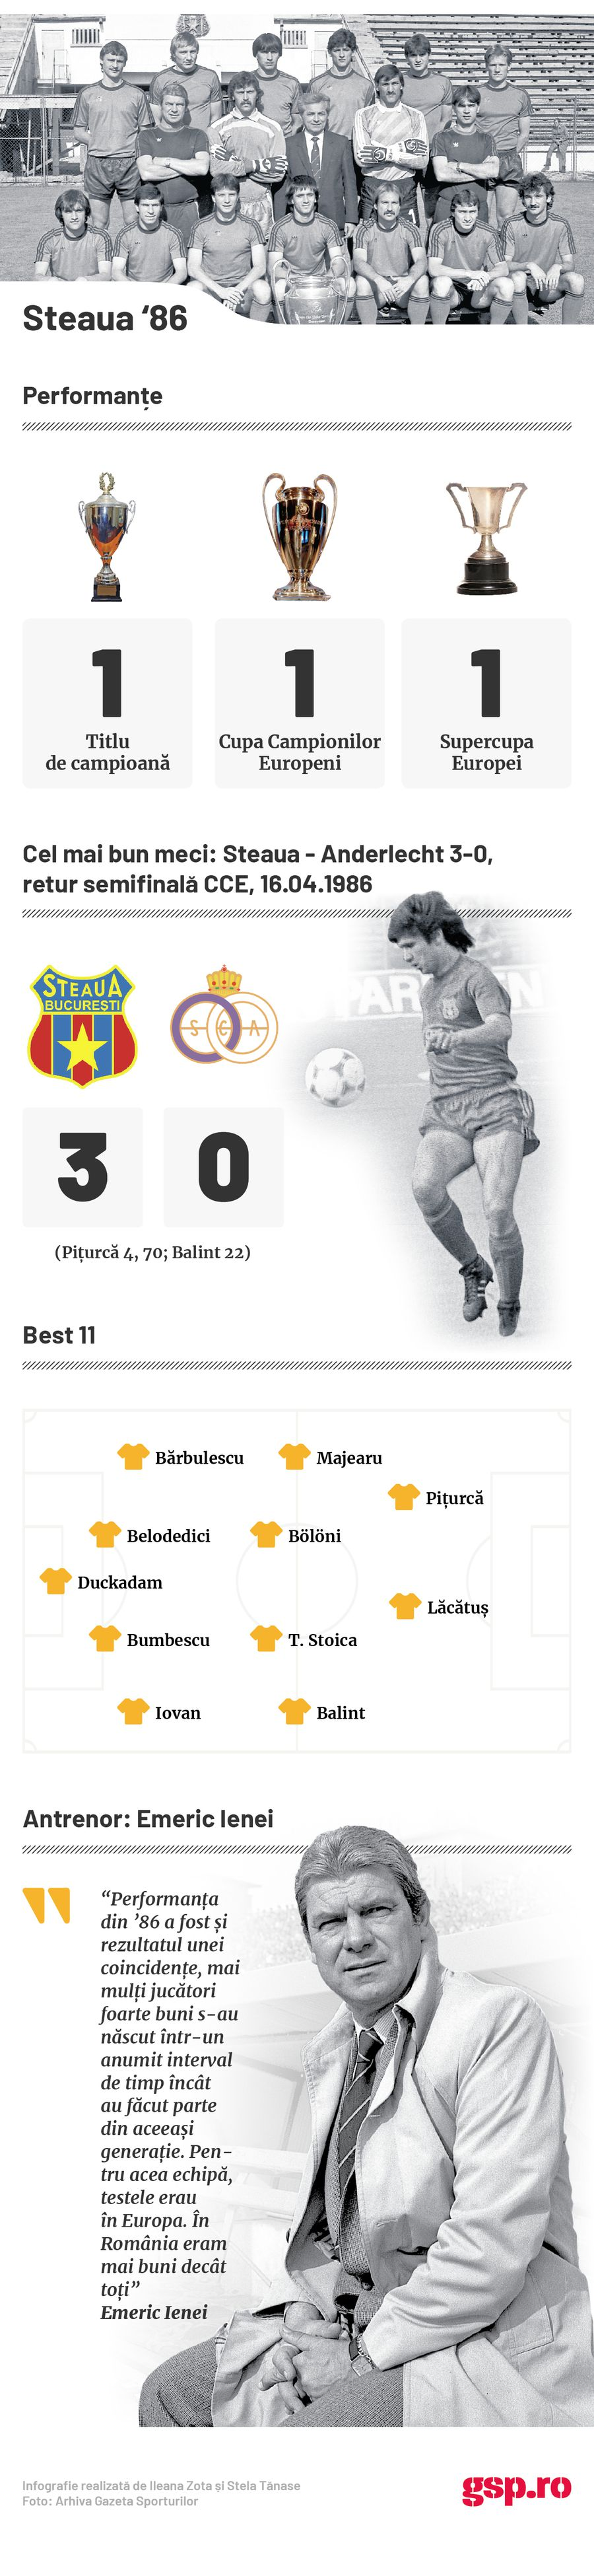 infografie Steaua 86